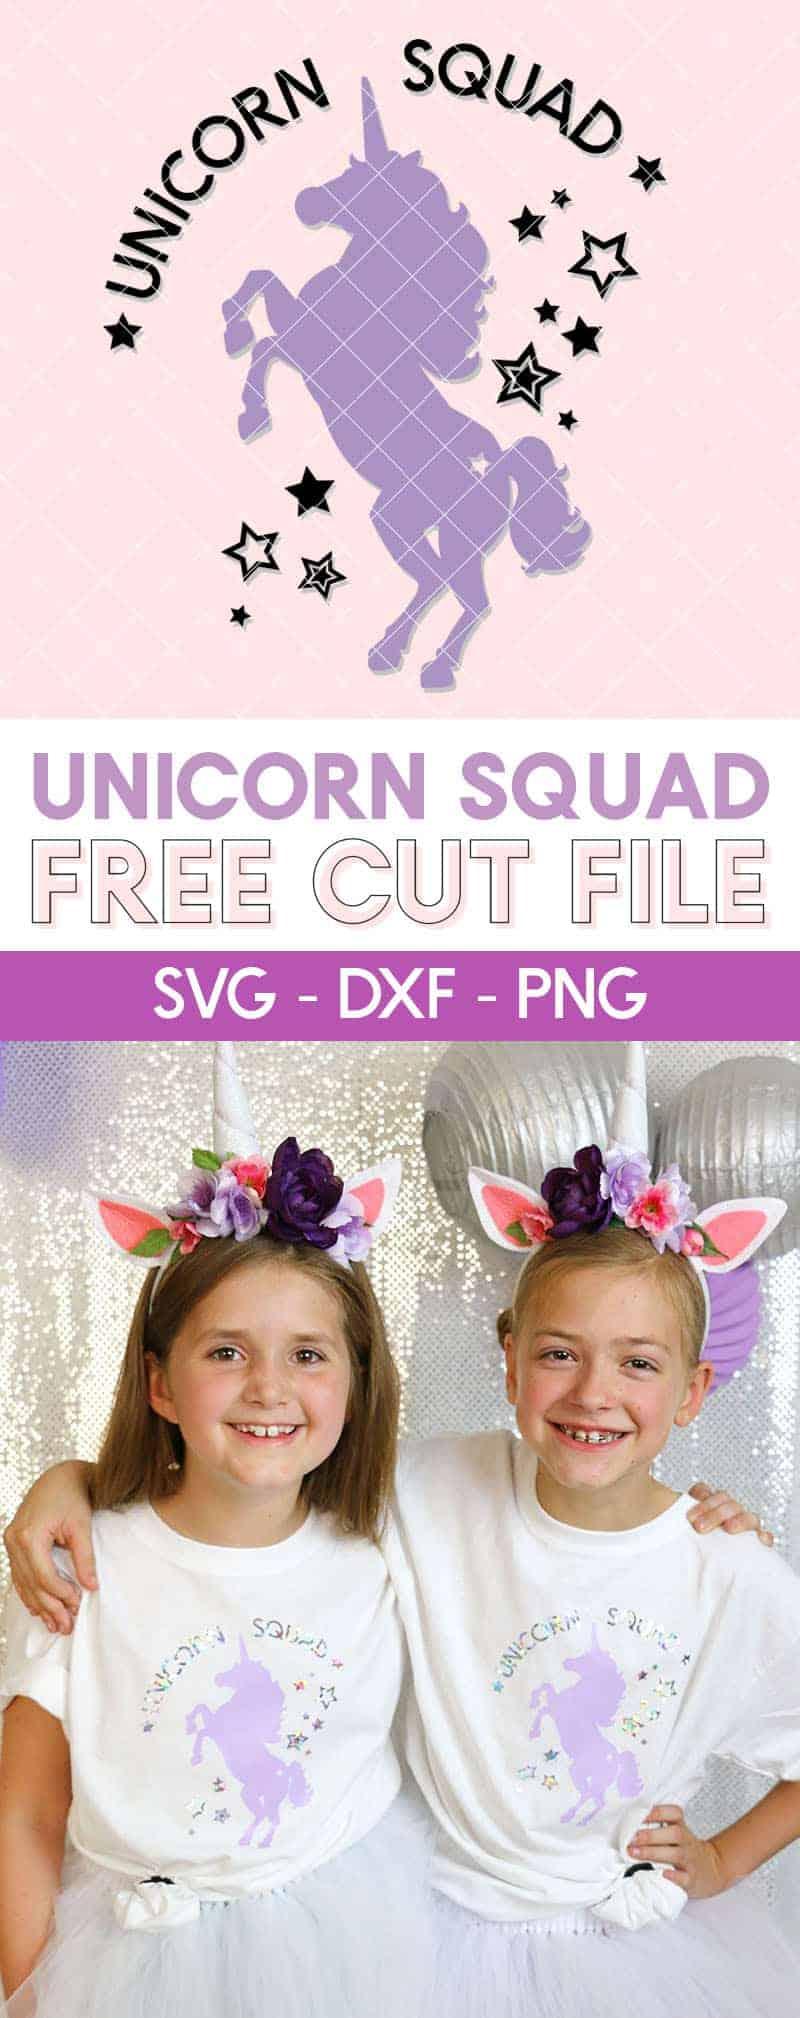 unicorn-squad-free-cut-file